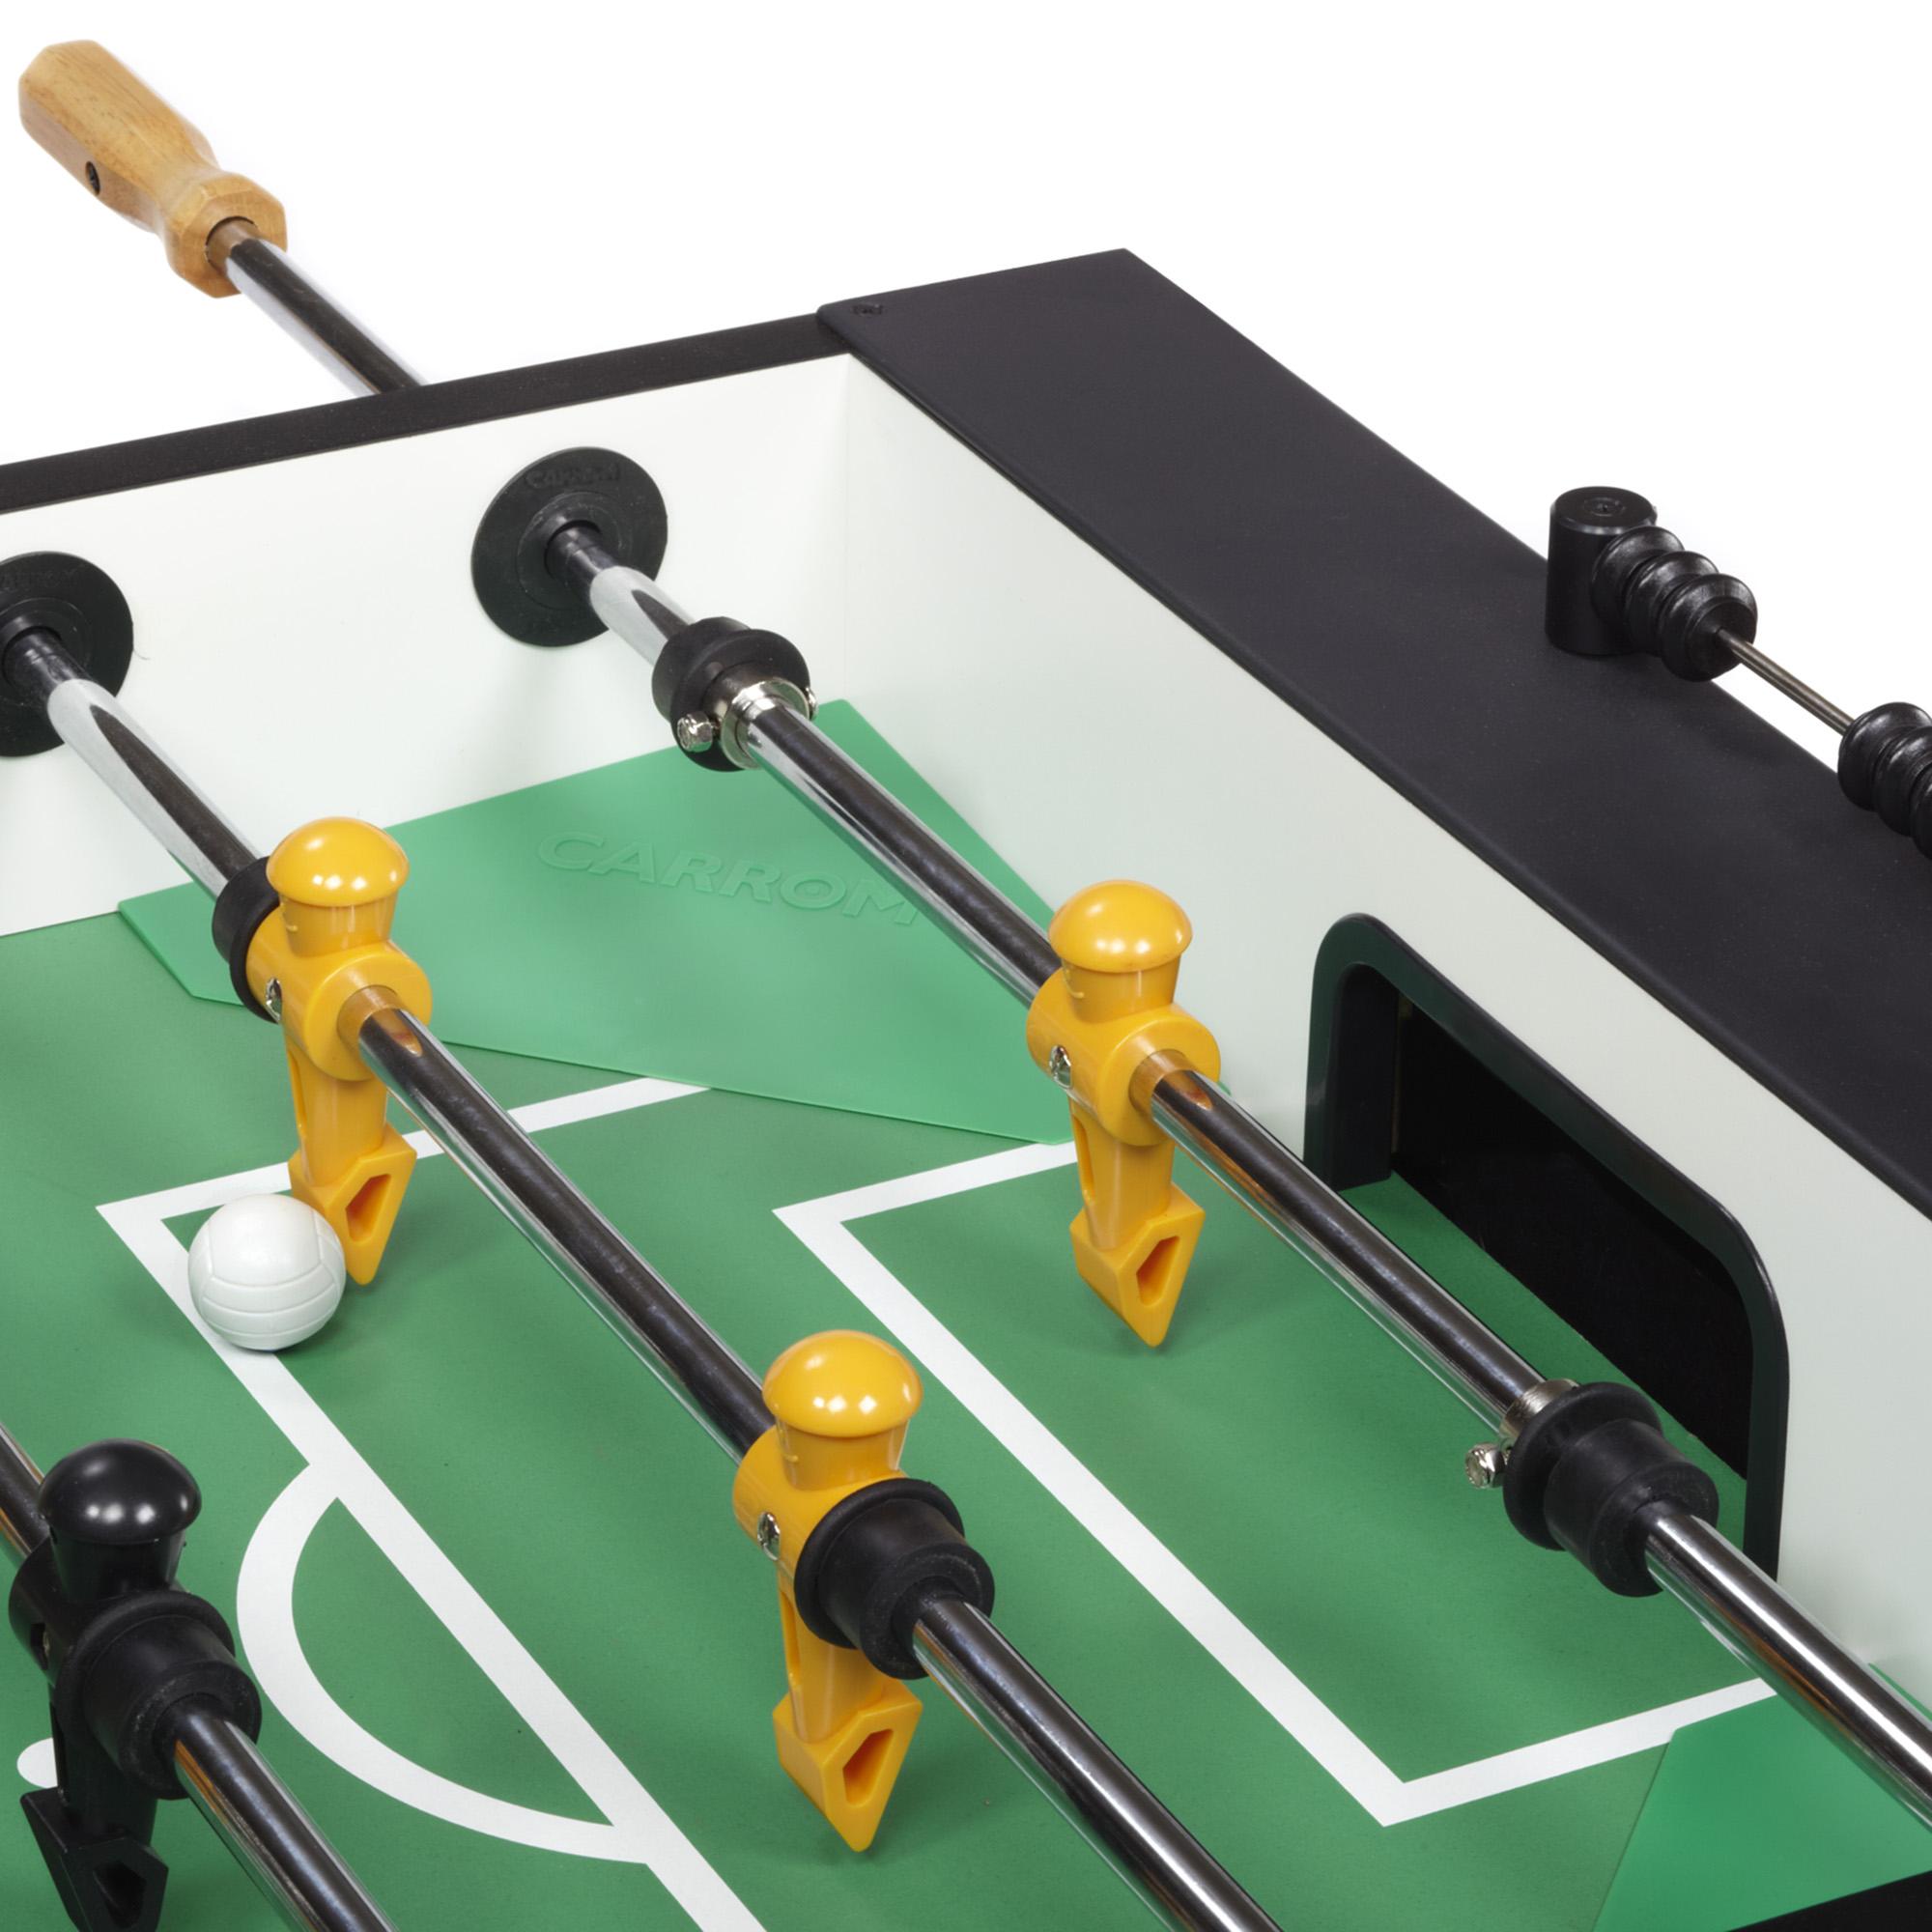 1 Goalie vs 3 Goalies: Top 1-Man Goalie Foosball Table Picks